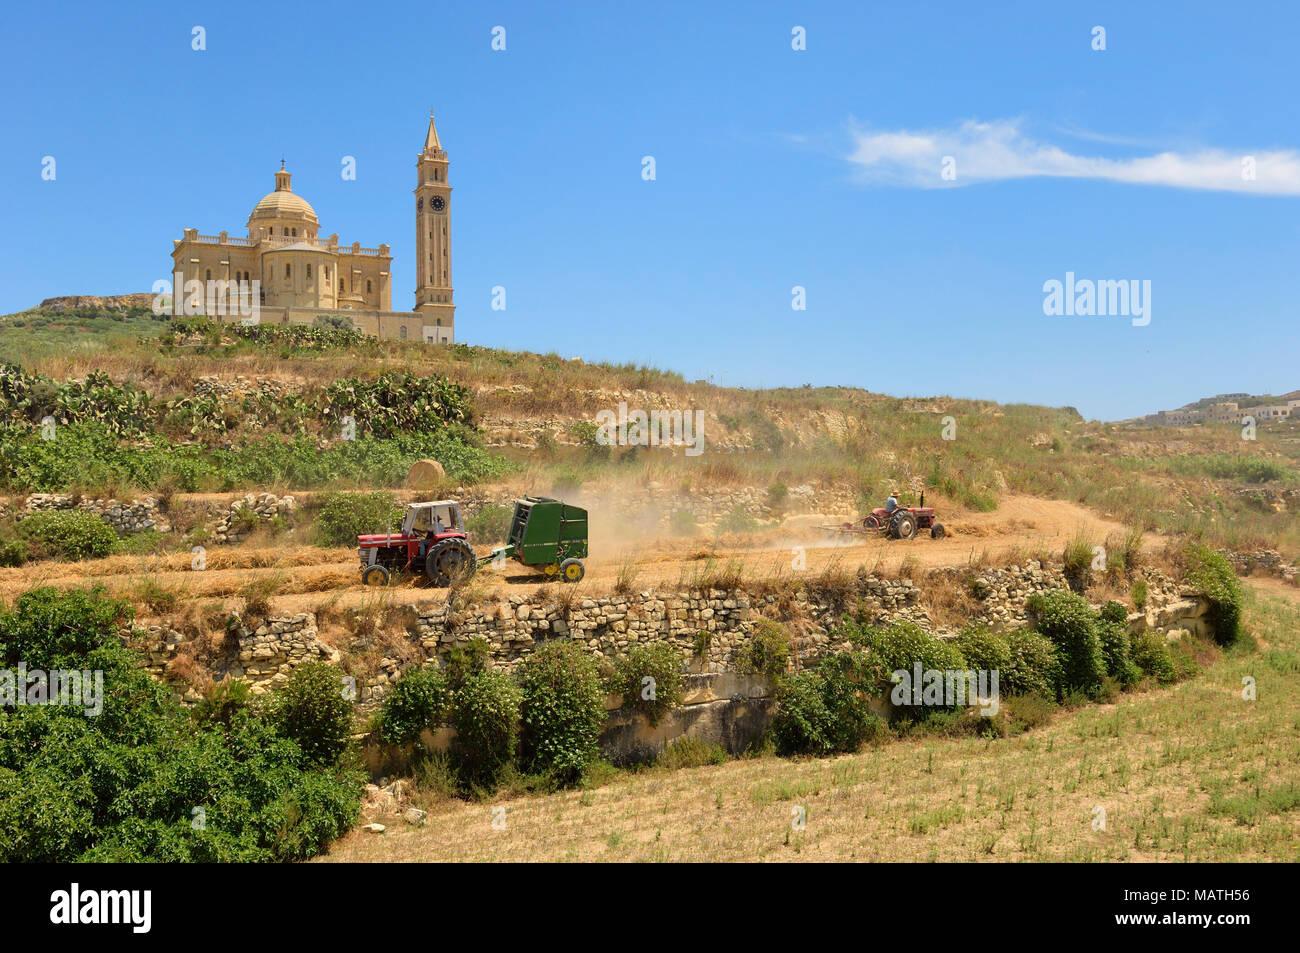 Ta' Pinu chiesa vicino a Gharb a Gozo, Malta, Europa Immagini Stock